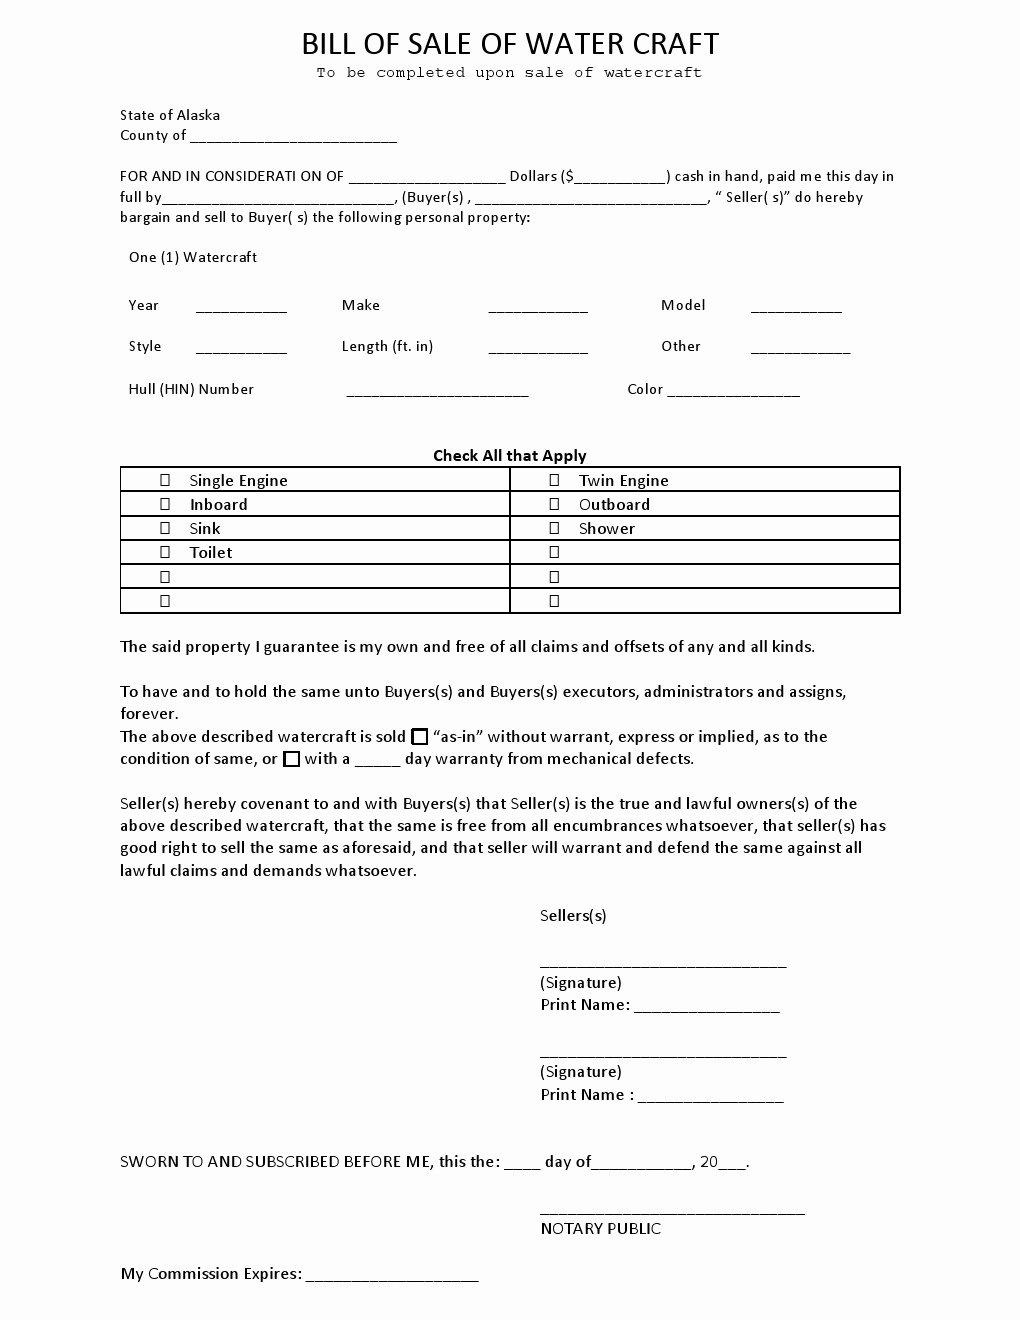 Watercraft Bill Of Sale Fresh Free Alaska Watercraft Bill Of Sale form Download Pdf